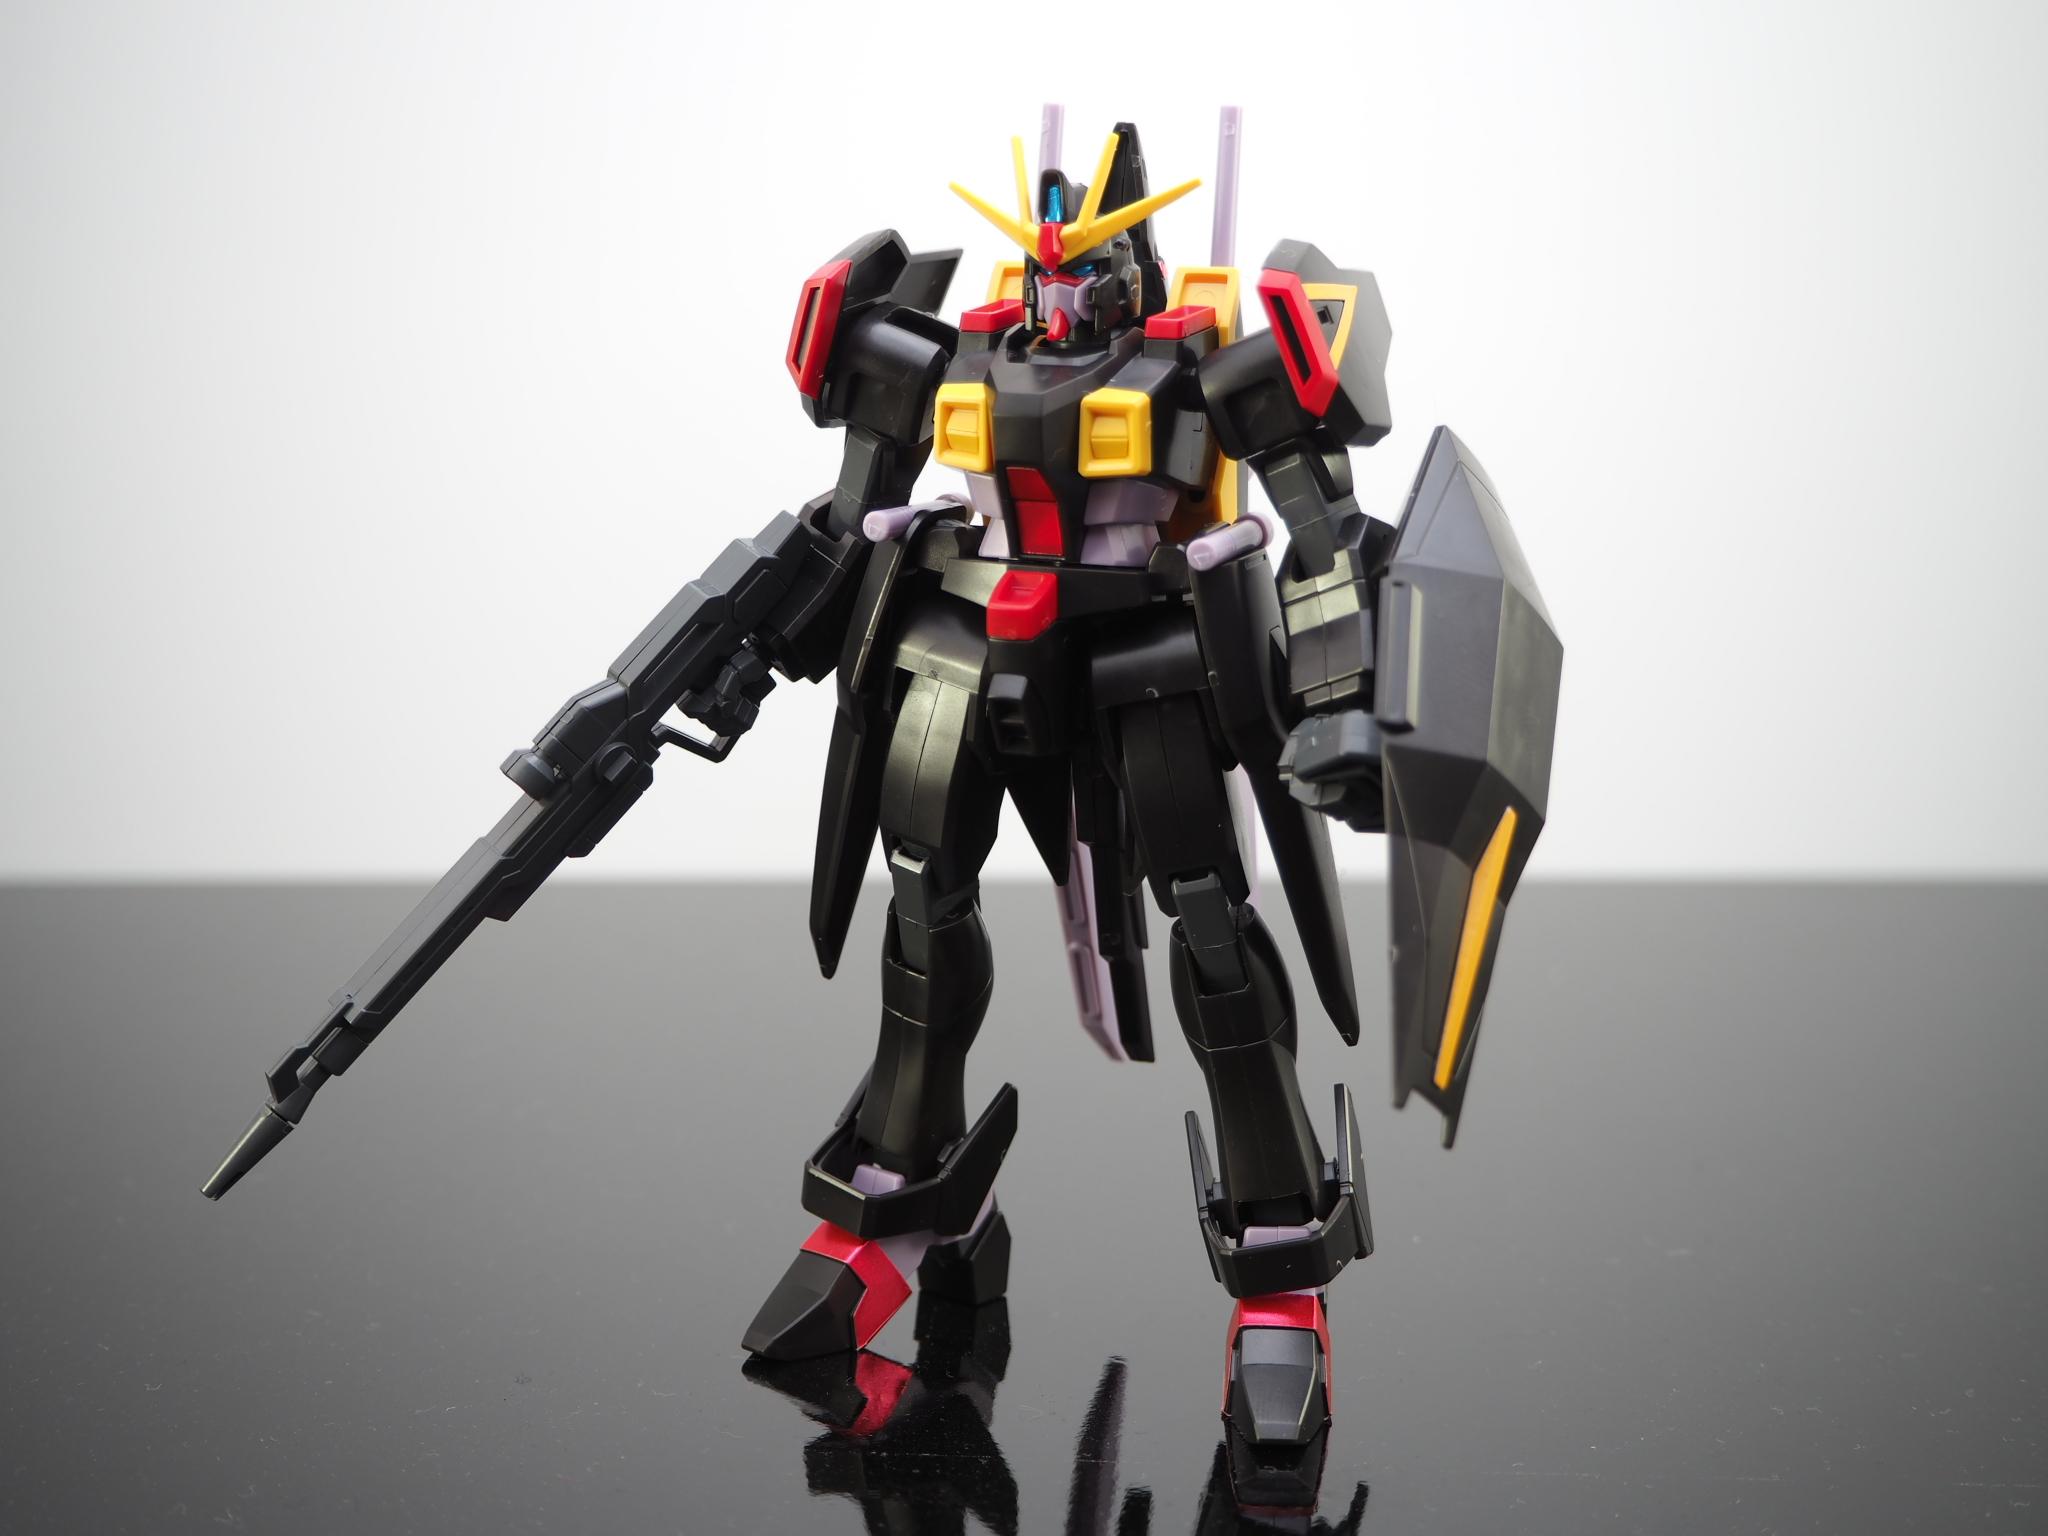 HG 1/144 ZGMF-X88S ガイアガンダム